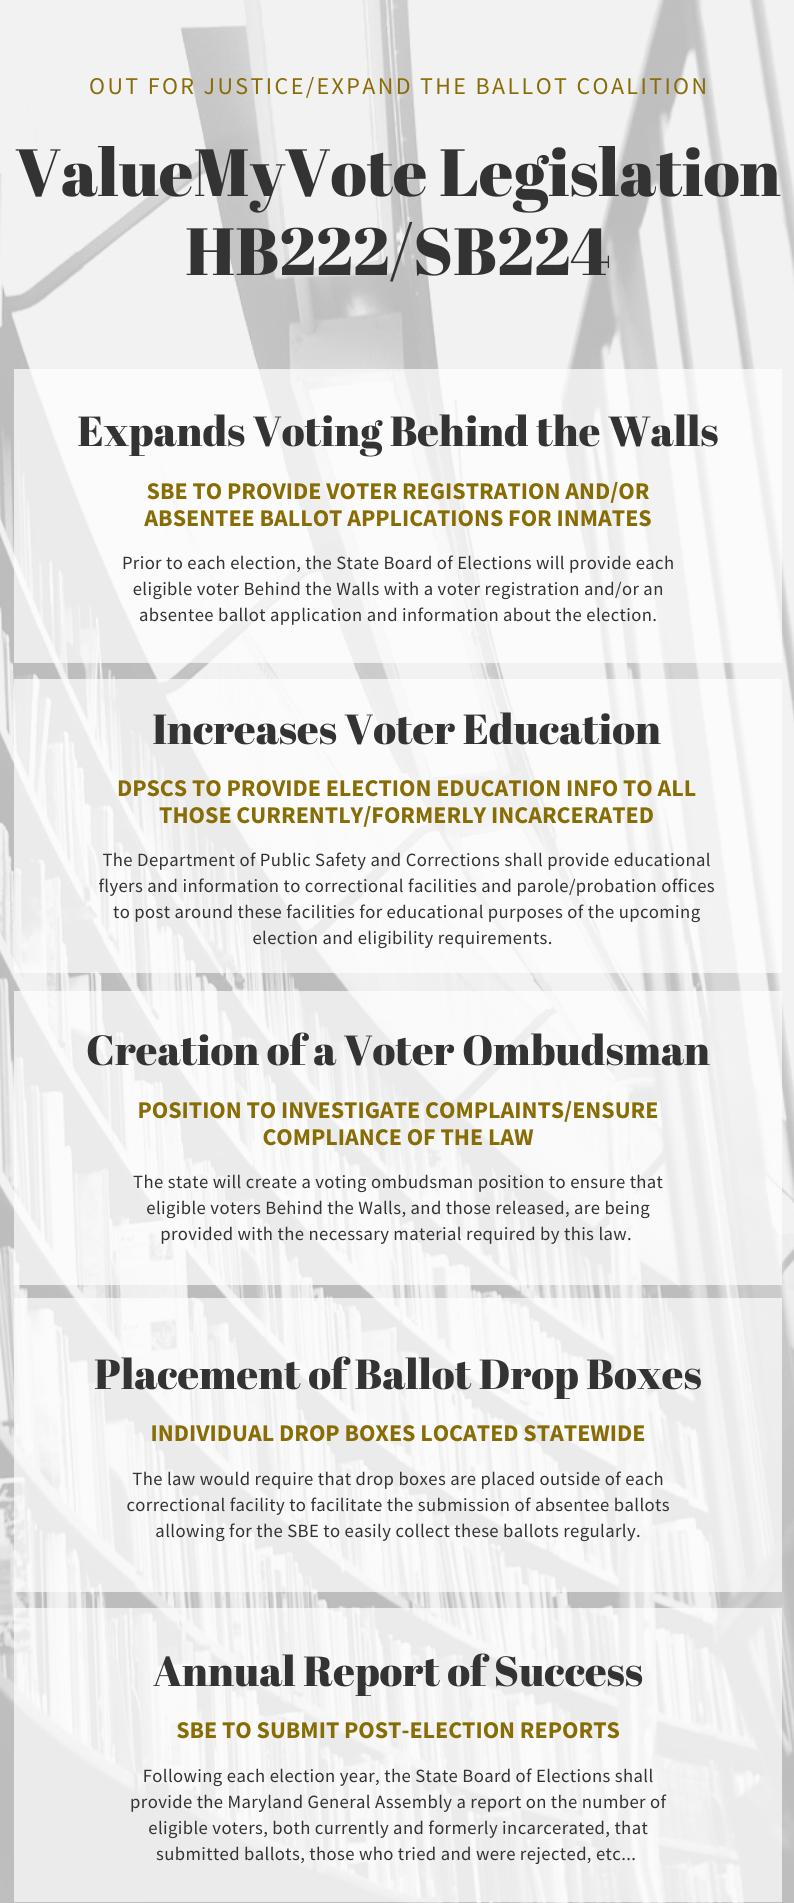 ValueMyVote Legislation